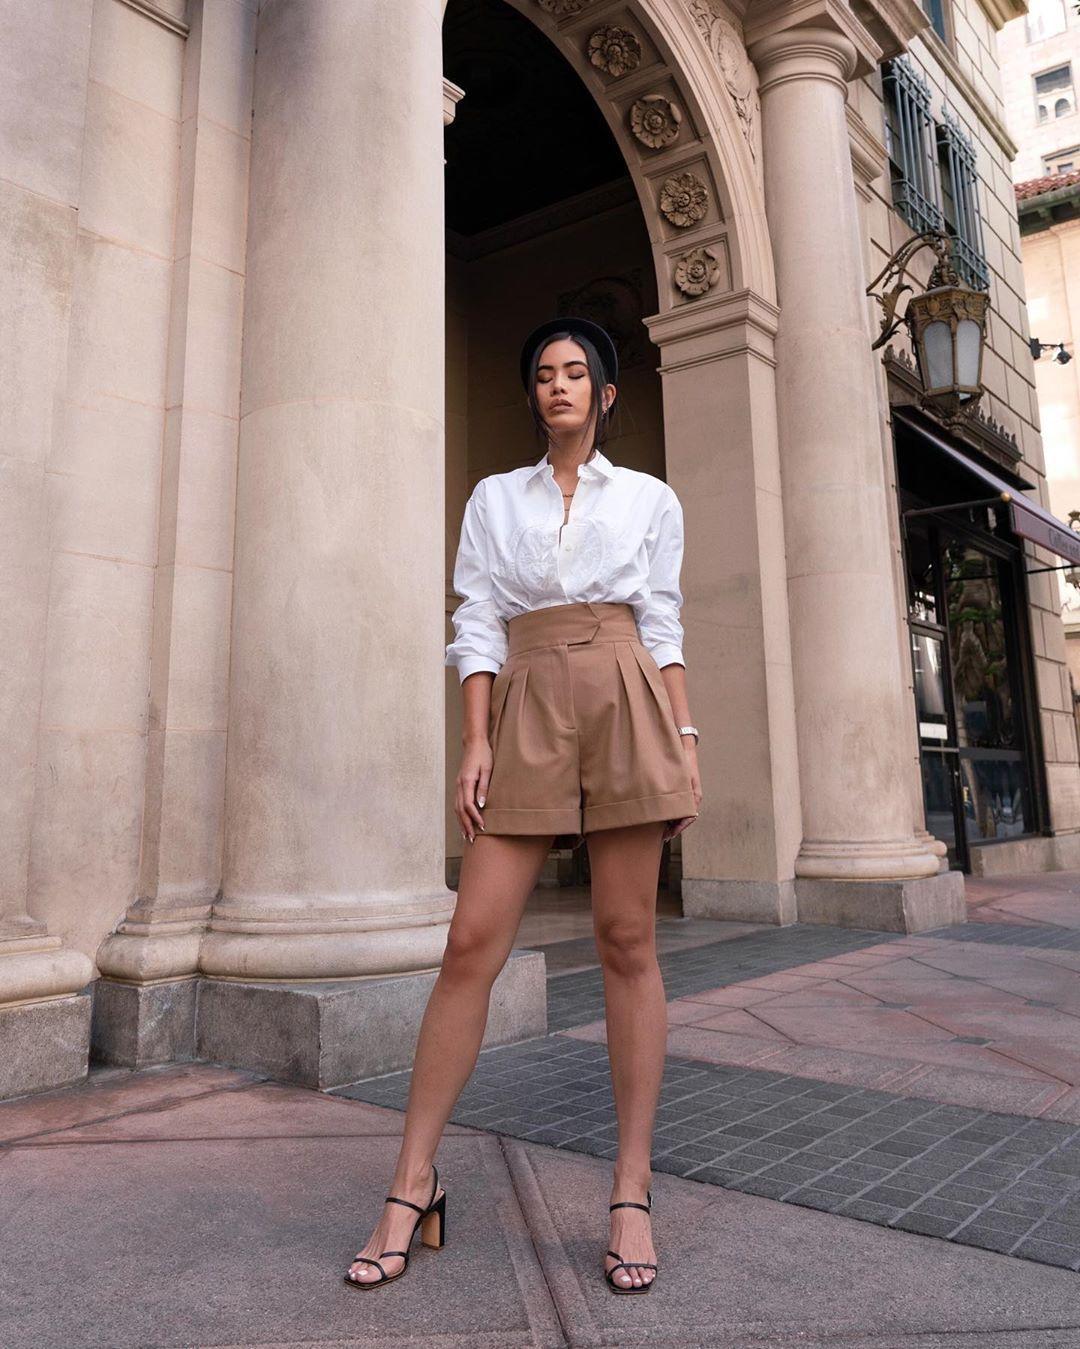 shorts High waisted shorts pleated black sandals white shirt